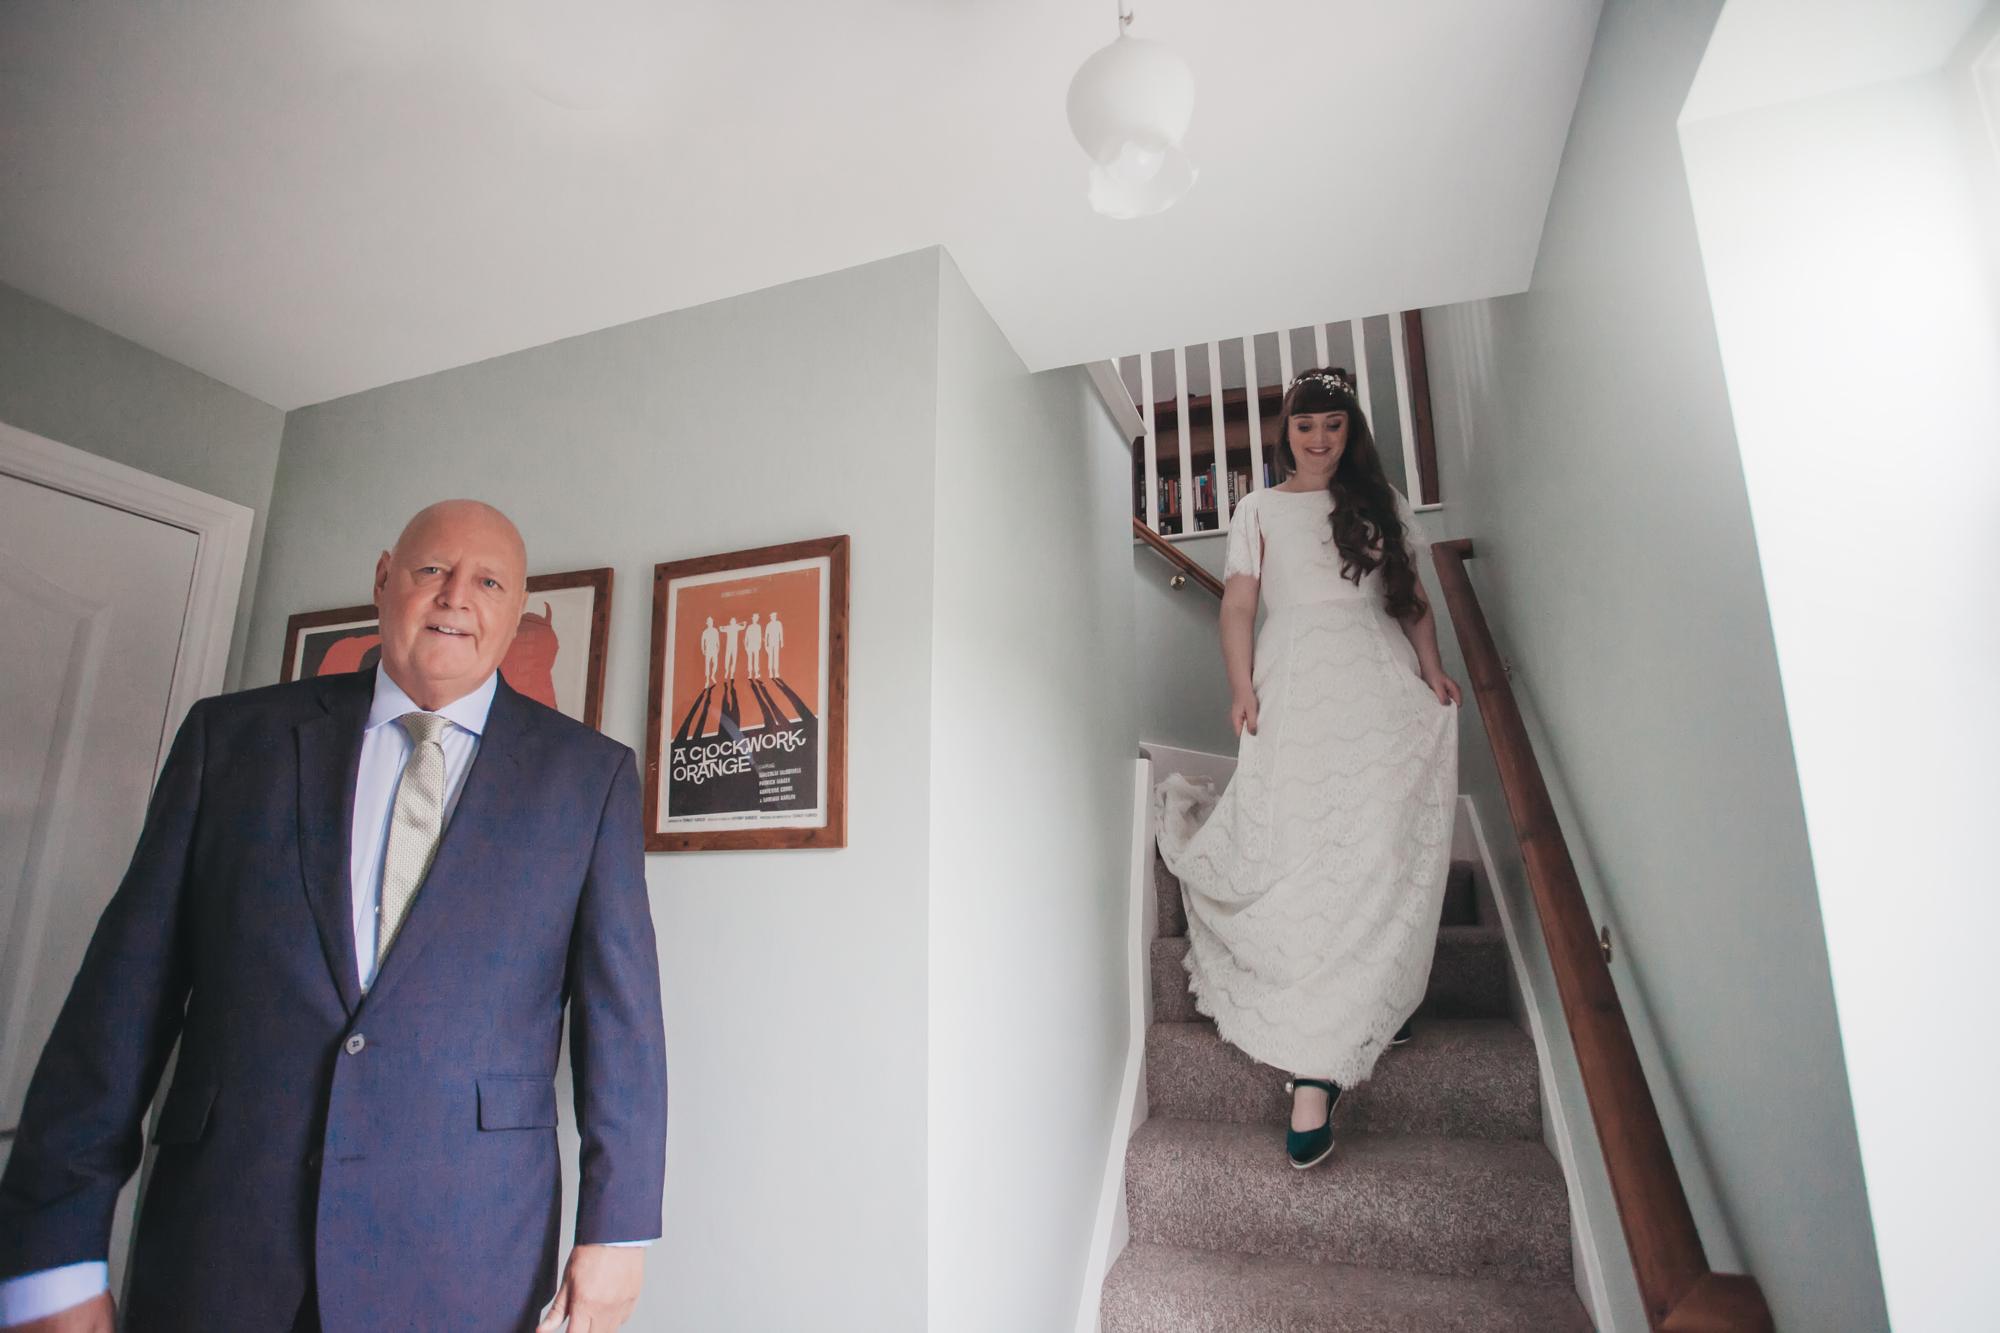 Kristy-Back-Garden-Outdoor-Wedding-Sheffield-Industrial-Warehouse-Wedding-Bohemian-Kate-Beaumont-Dahlia-Dress-6.jpg